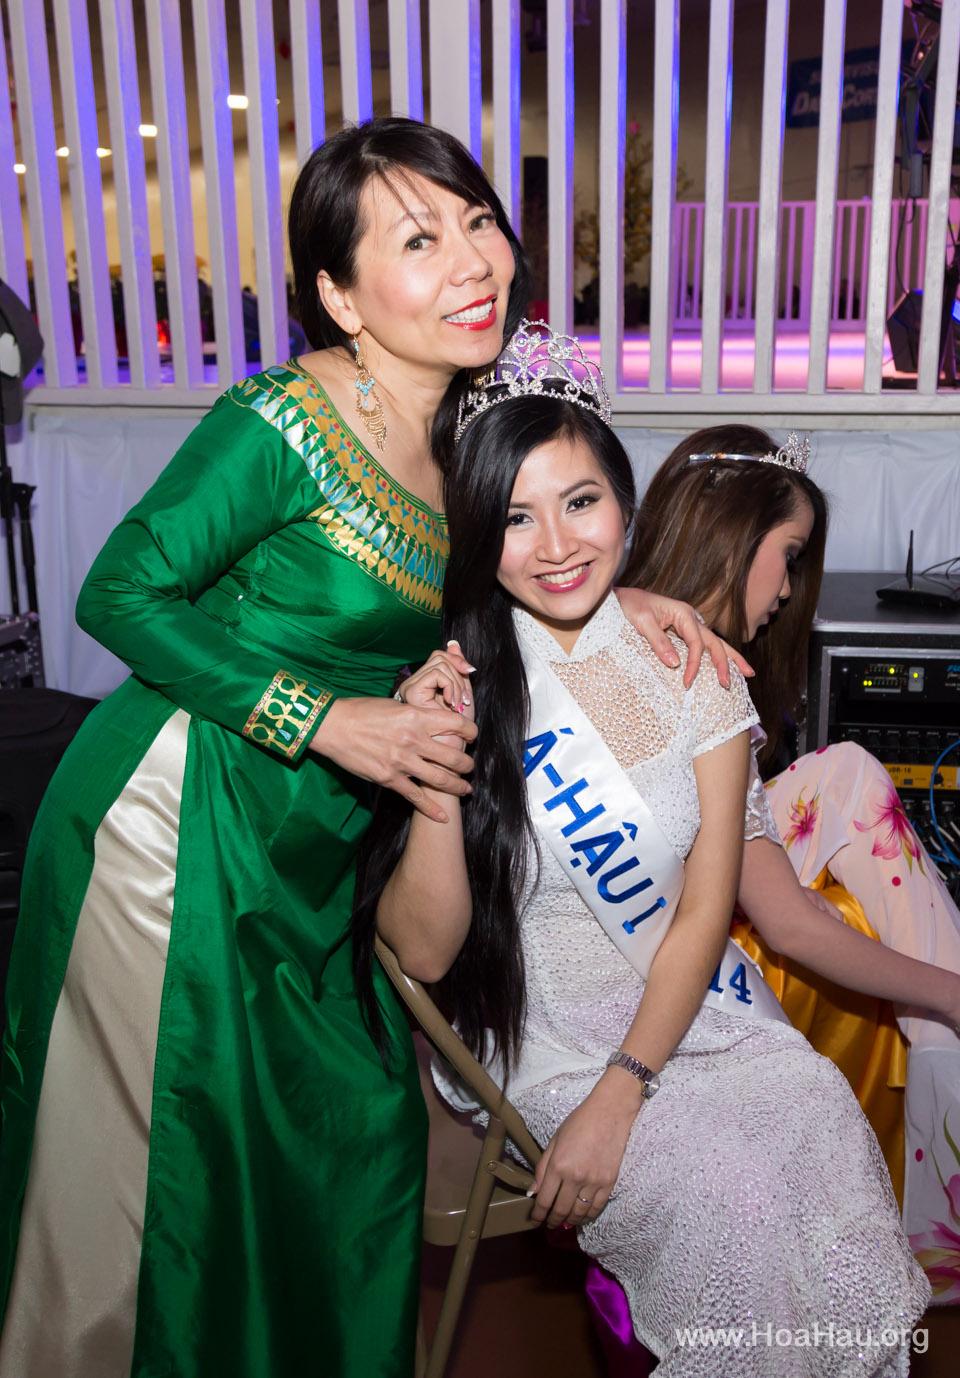 Tet Fairgrounds 2014 - Hoa Hậu Áo Dài Bắc Cali - Miss Vietnam of Northern California - Image 120